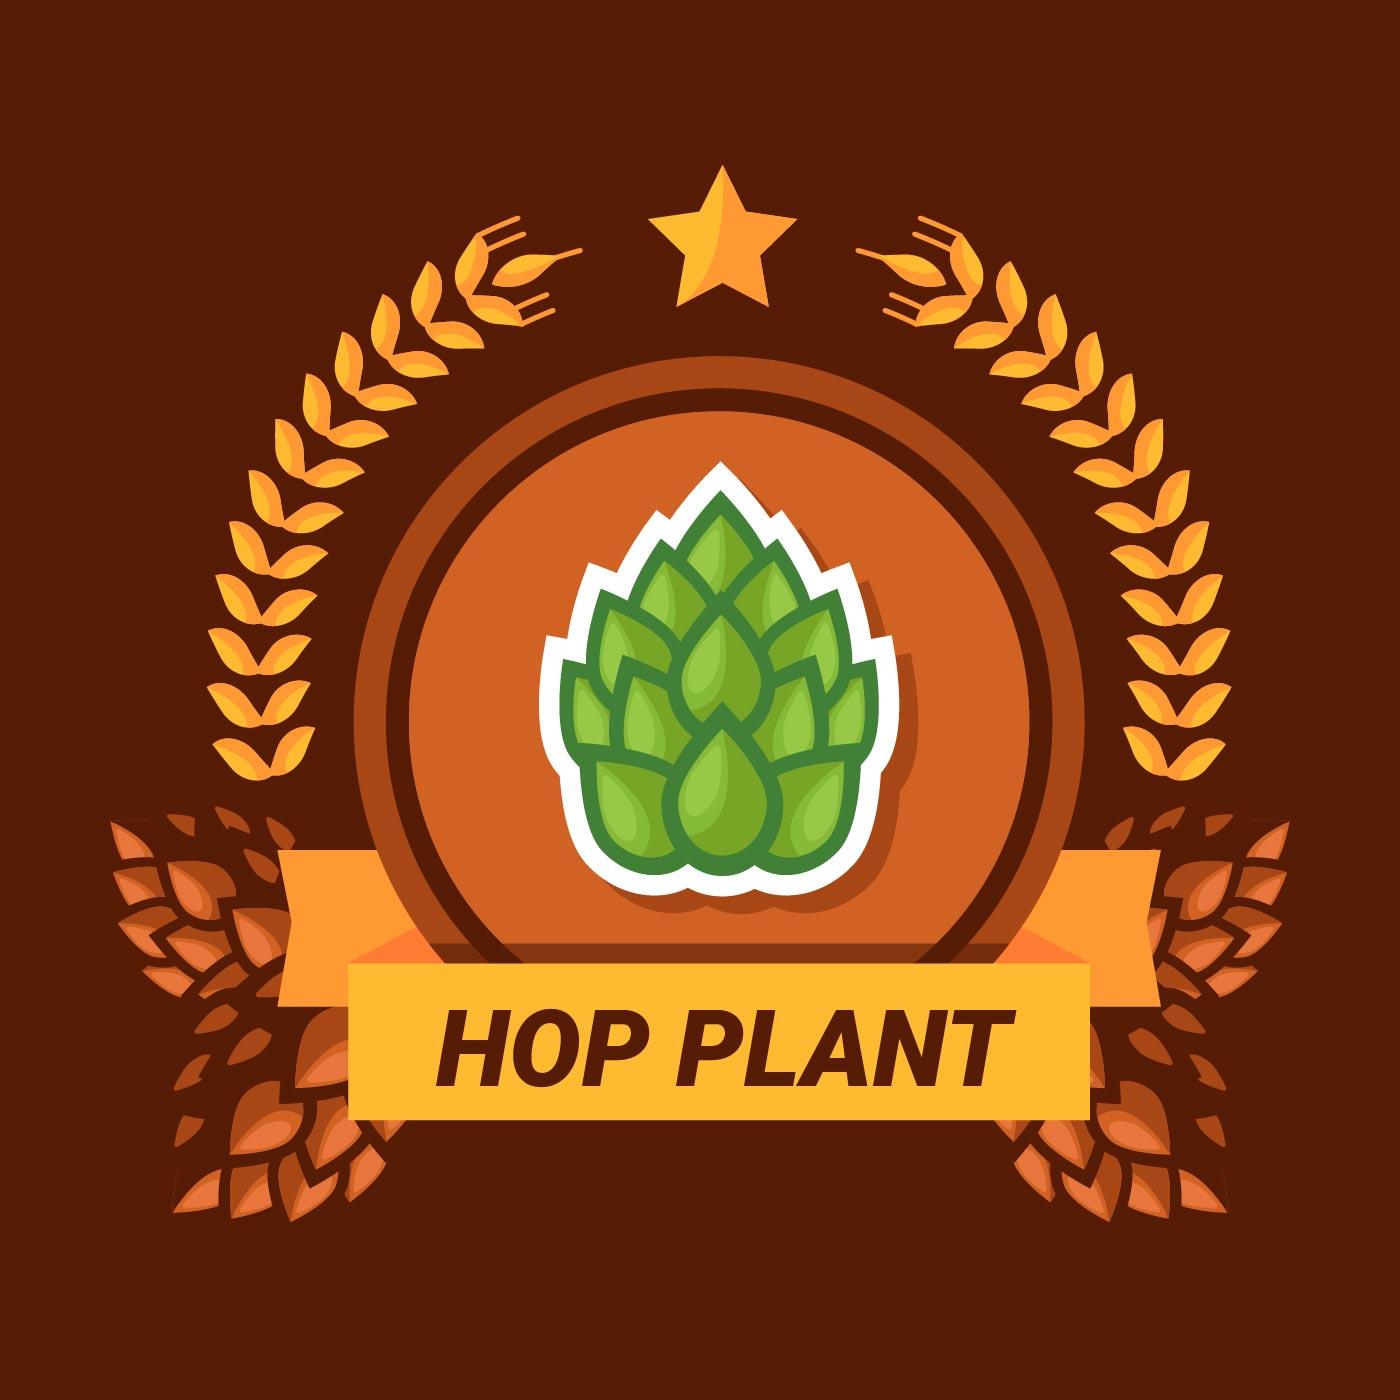 hop plant logo download free vector art stock graphics